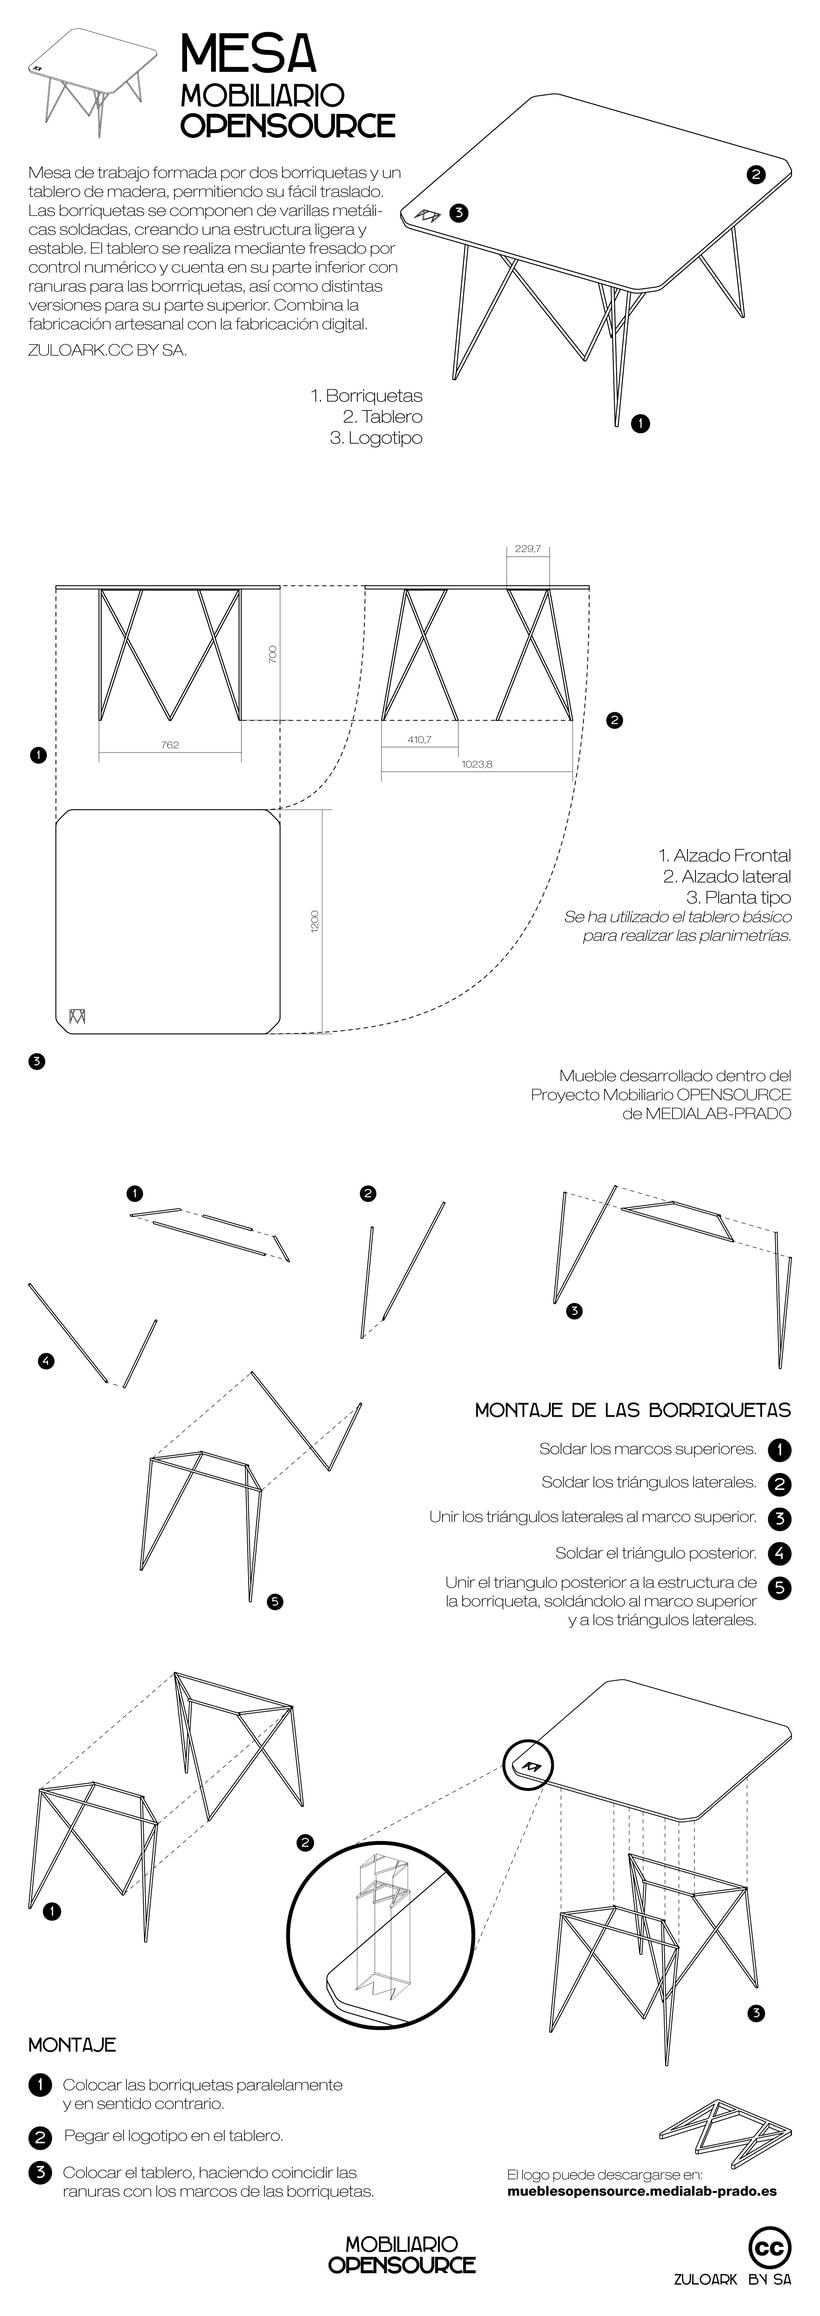 Mobiliario Opensource 2